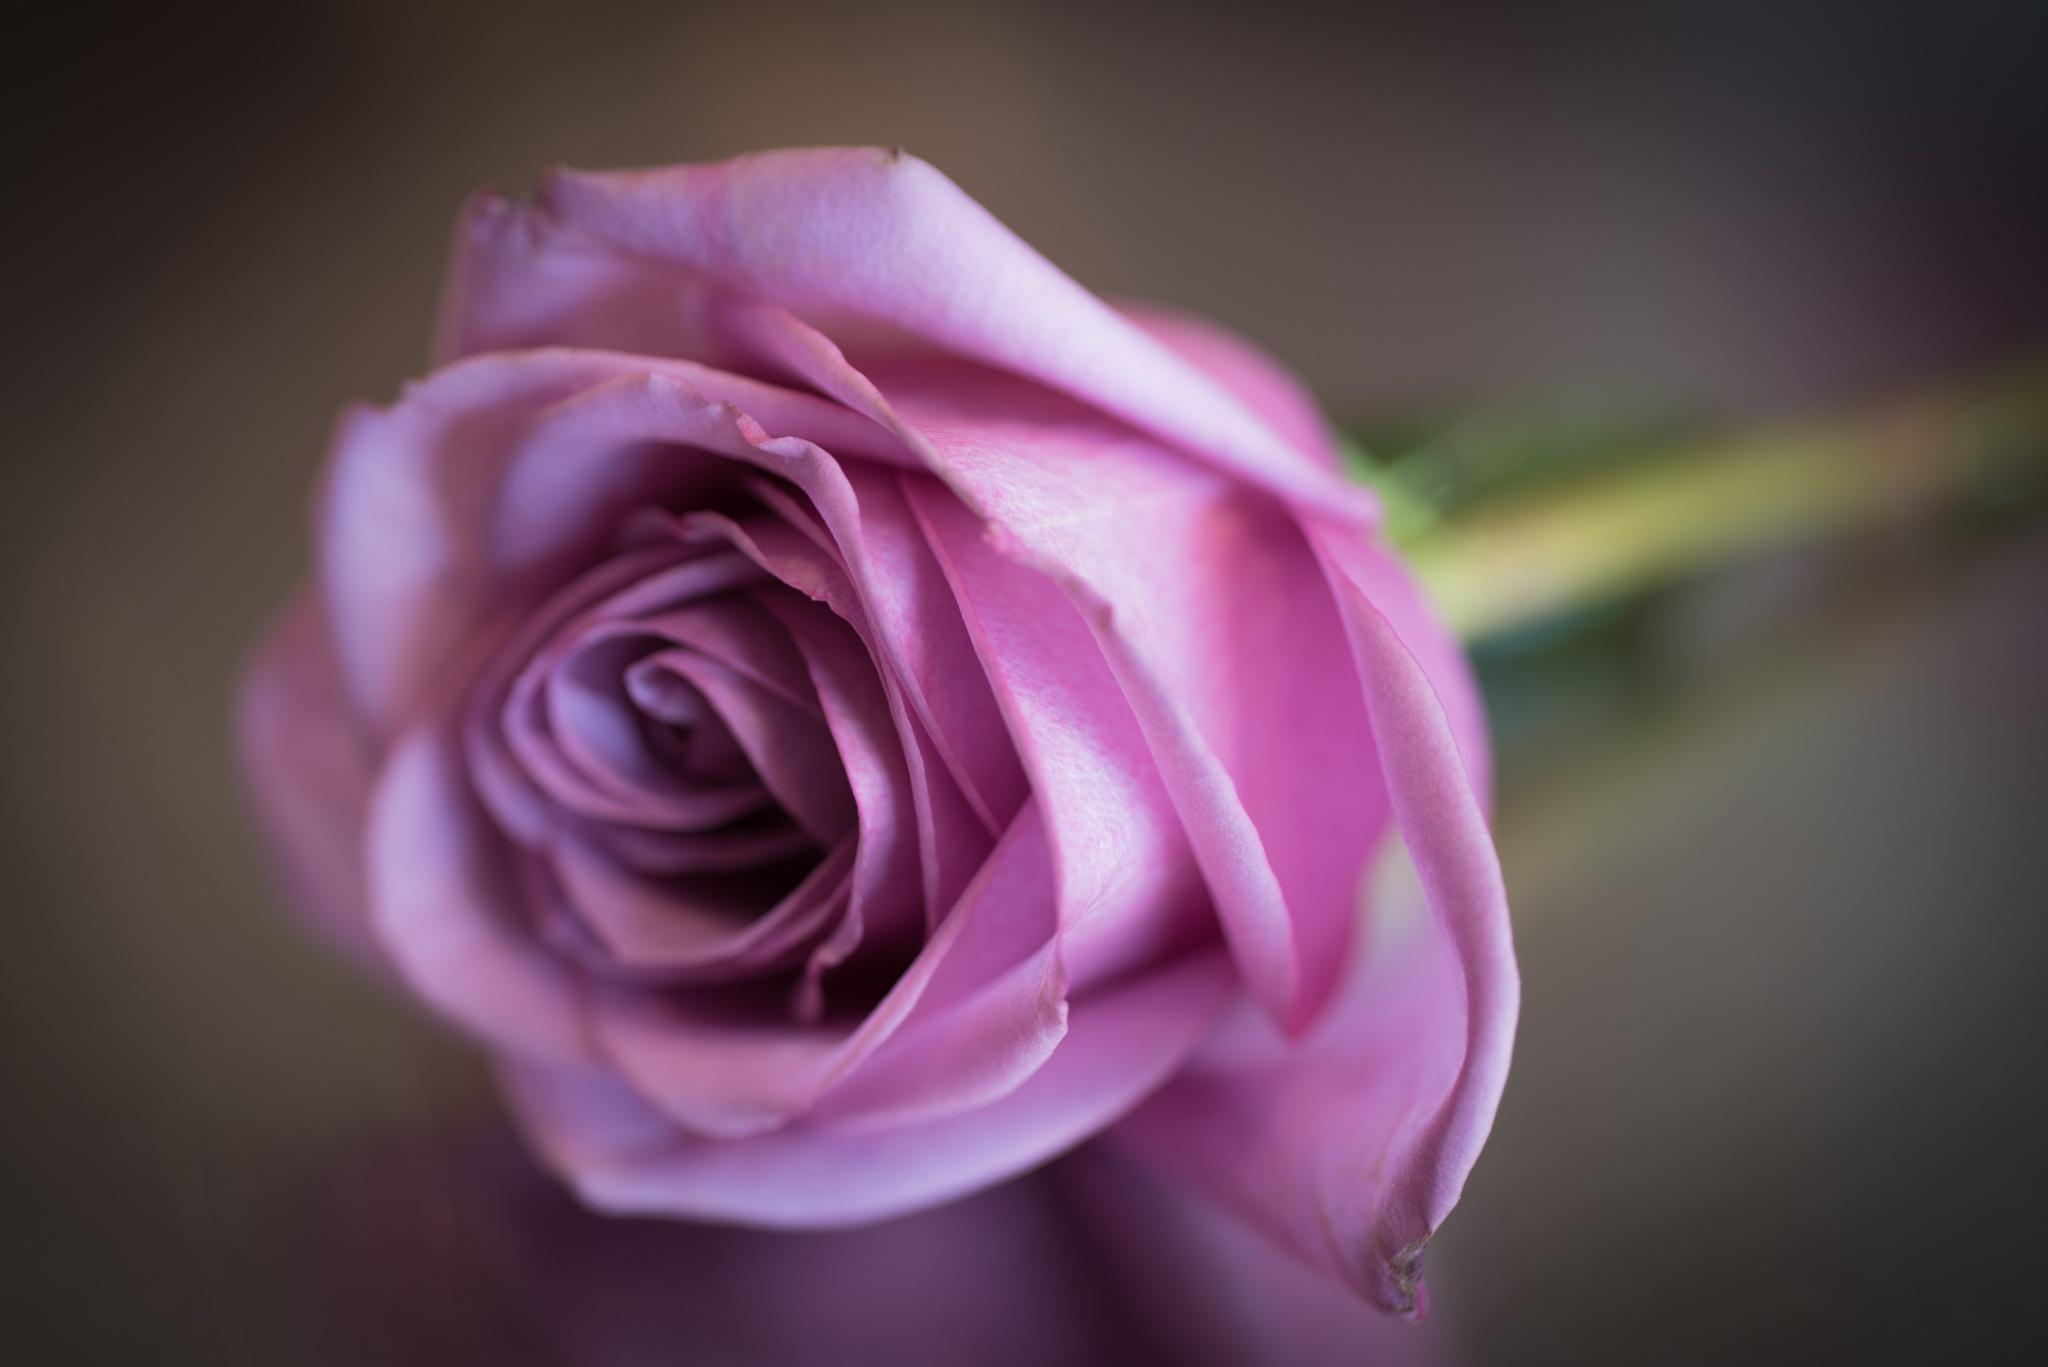 Rose by Kevin Drew Davis